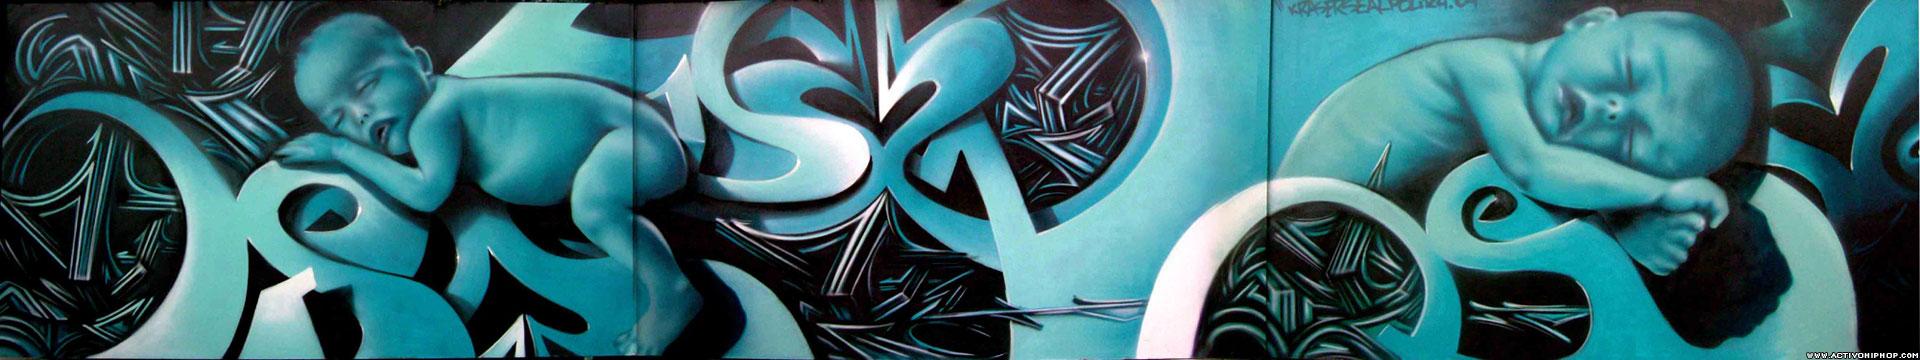 Graffiti de Cartagena parte 2: Poli124